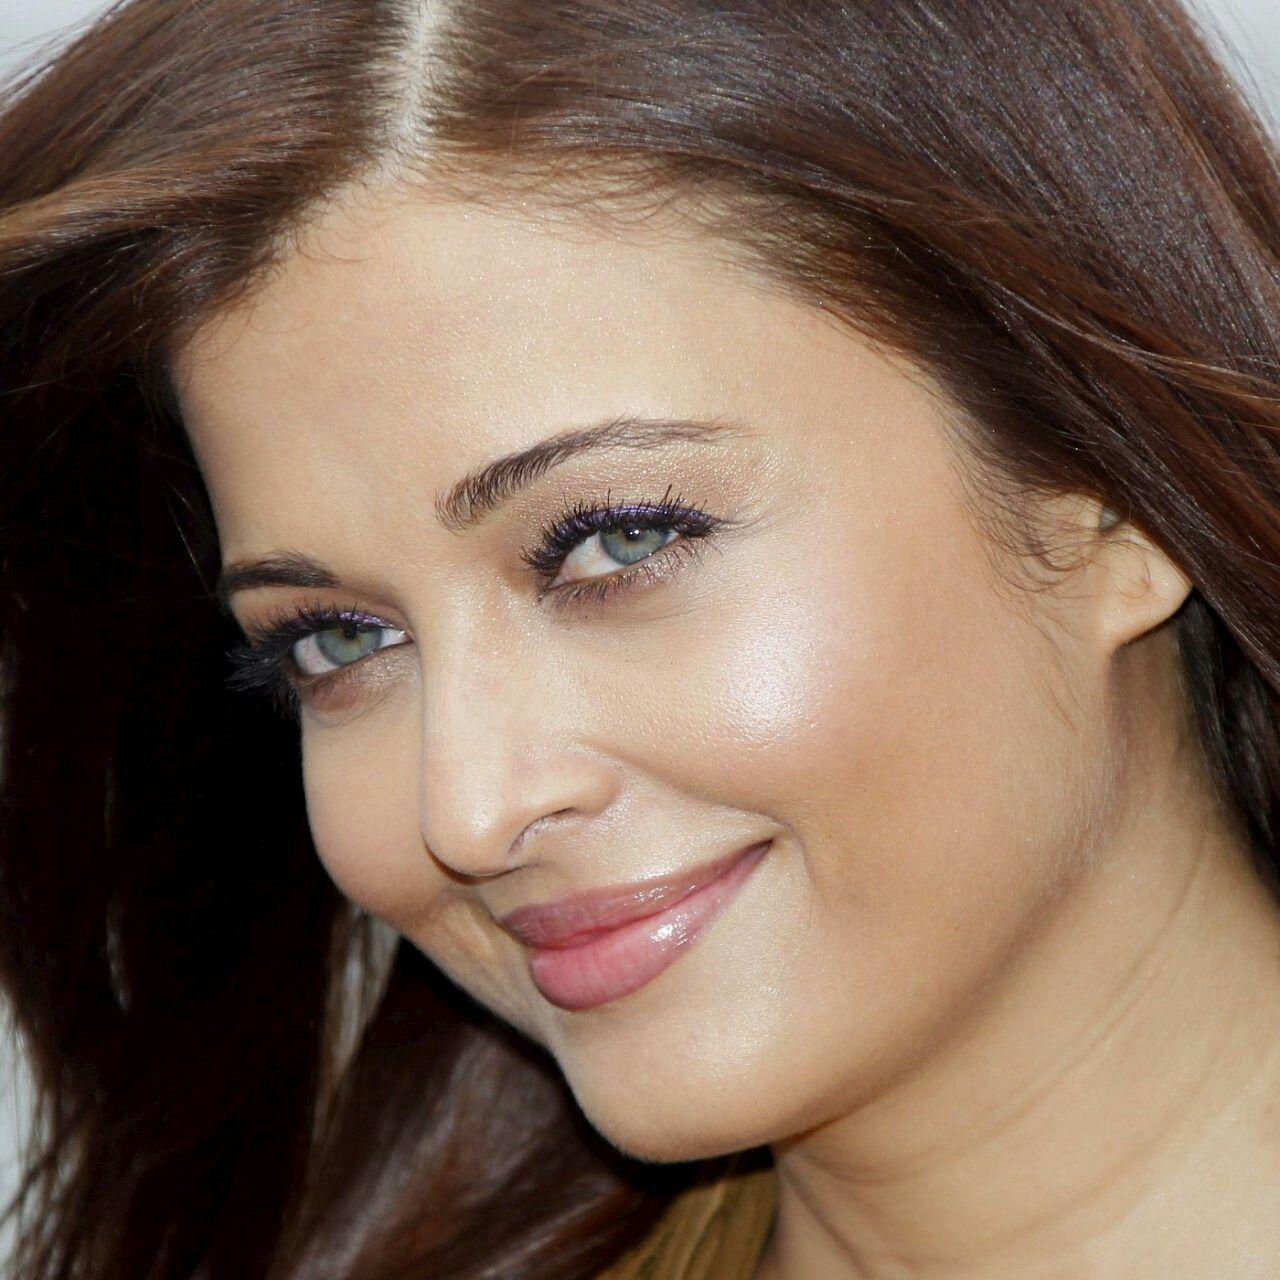 Aishwarya Rai Hd Pic Aishwarya Rai Young Aishwarya Rai Bollywood Actress